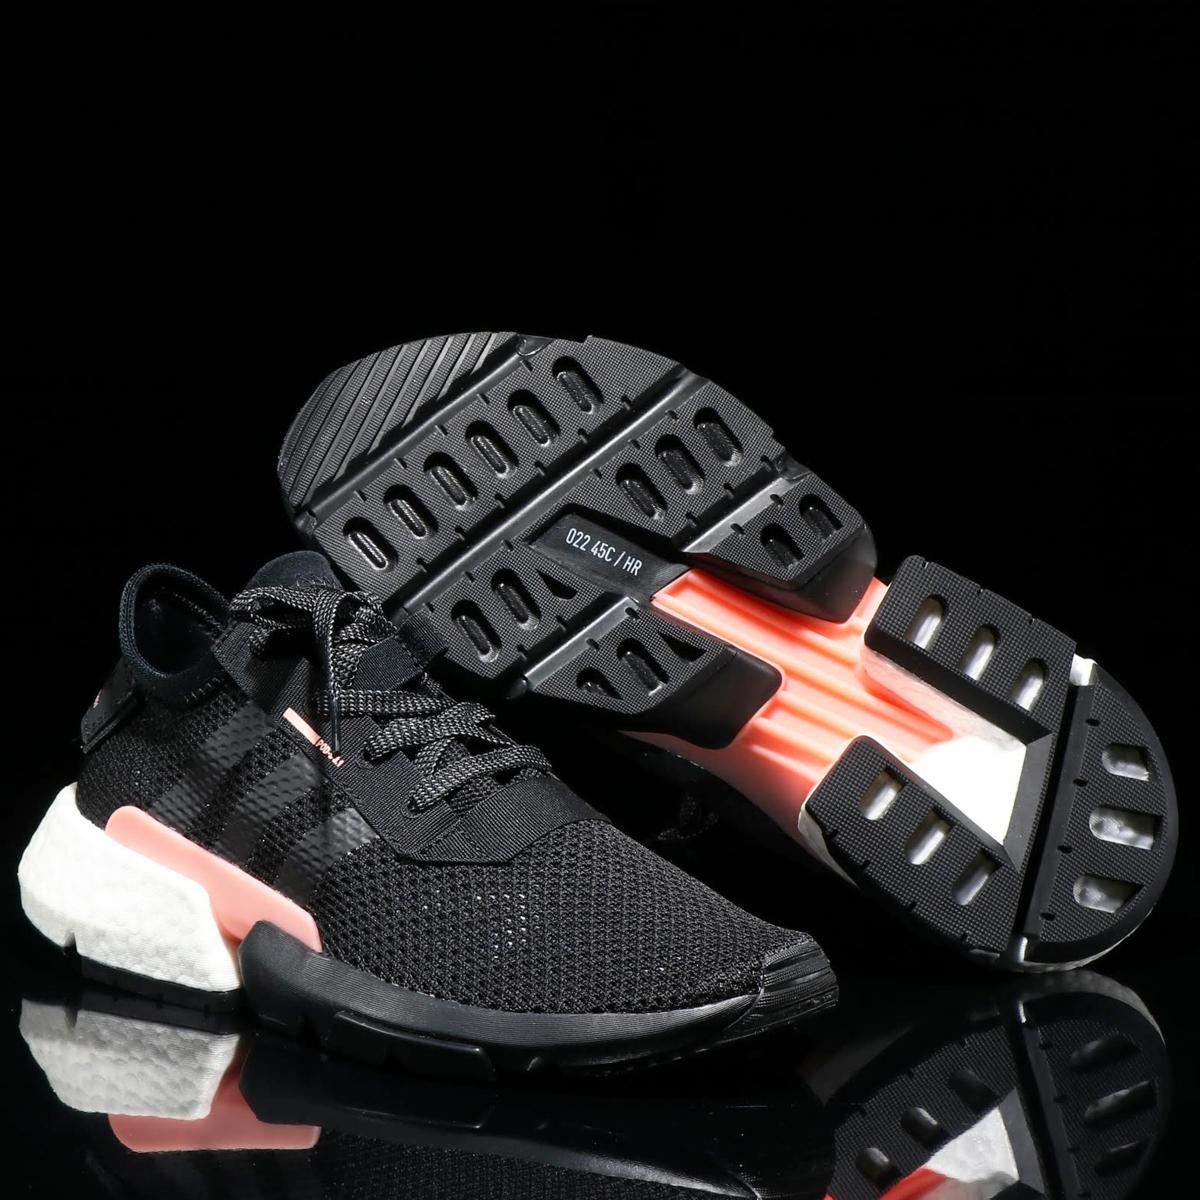 adidas Originals POD-S3.1(アディダス オリジナルス ピーオーディーS3.1)CORE BLACK/CORE BLACK/CLEAR ORANGE【メンズ スニーカー】18FW-I